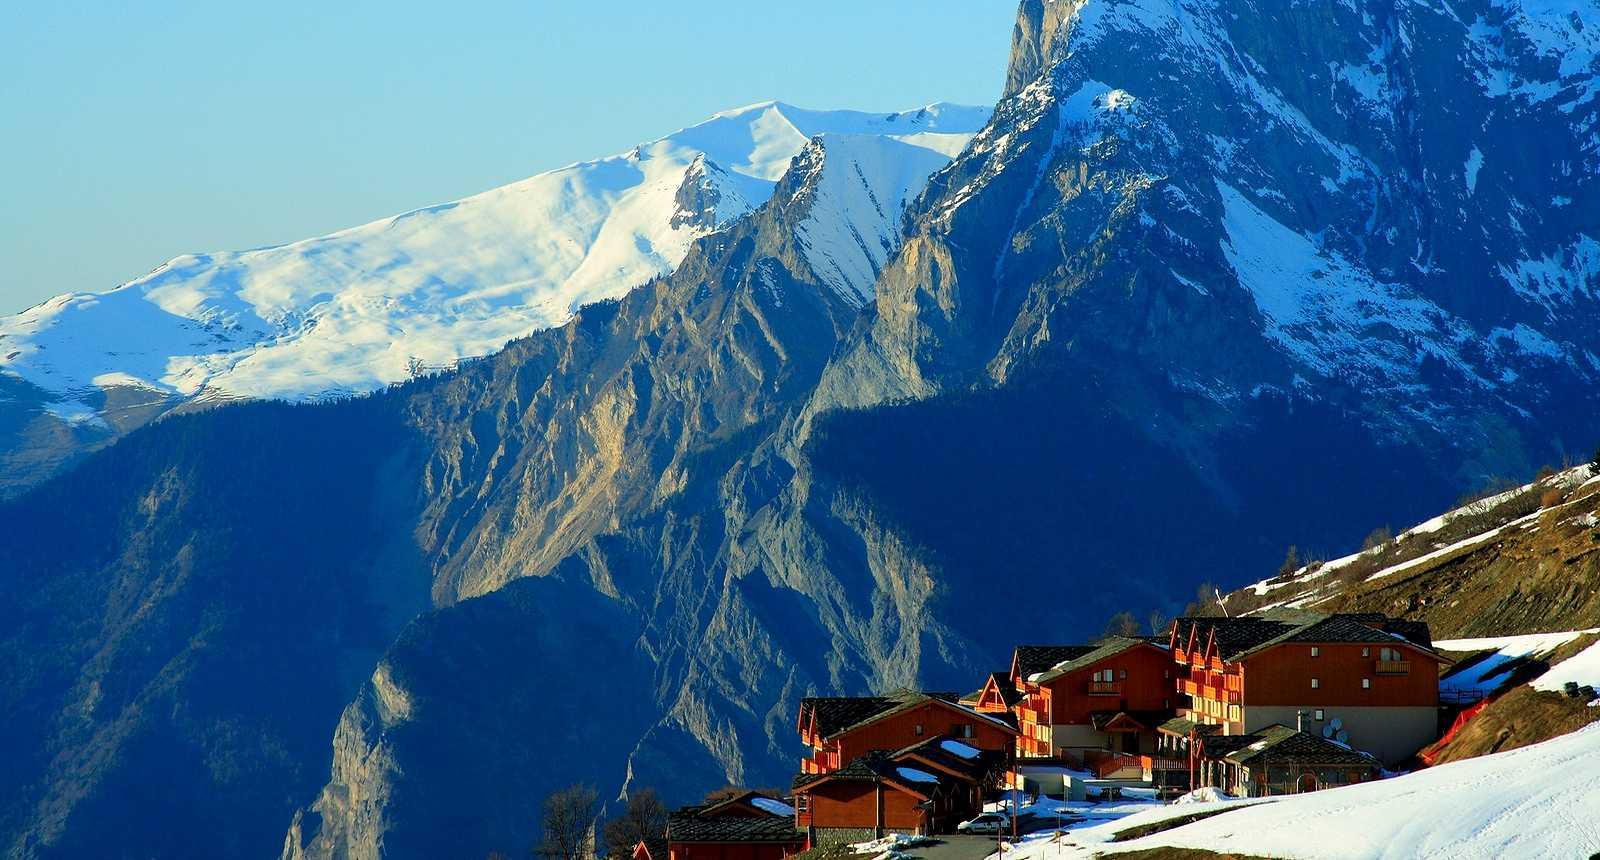 Station de ski de Valmenier